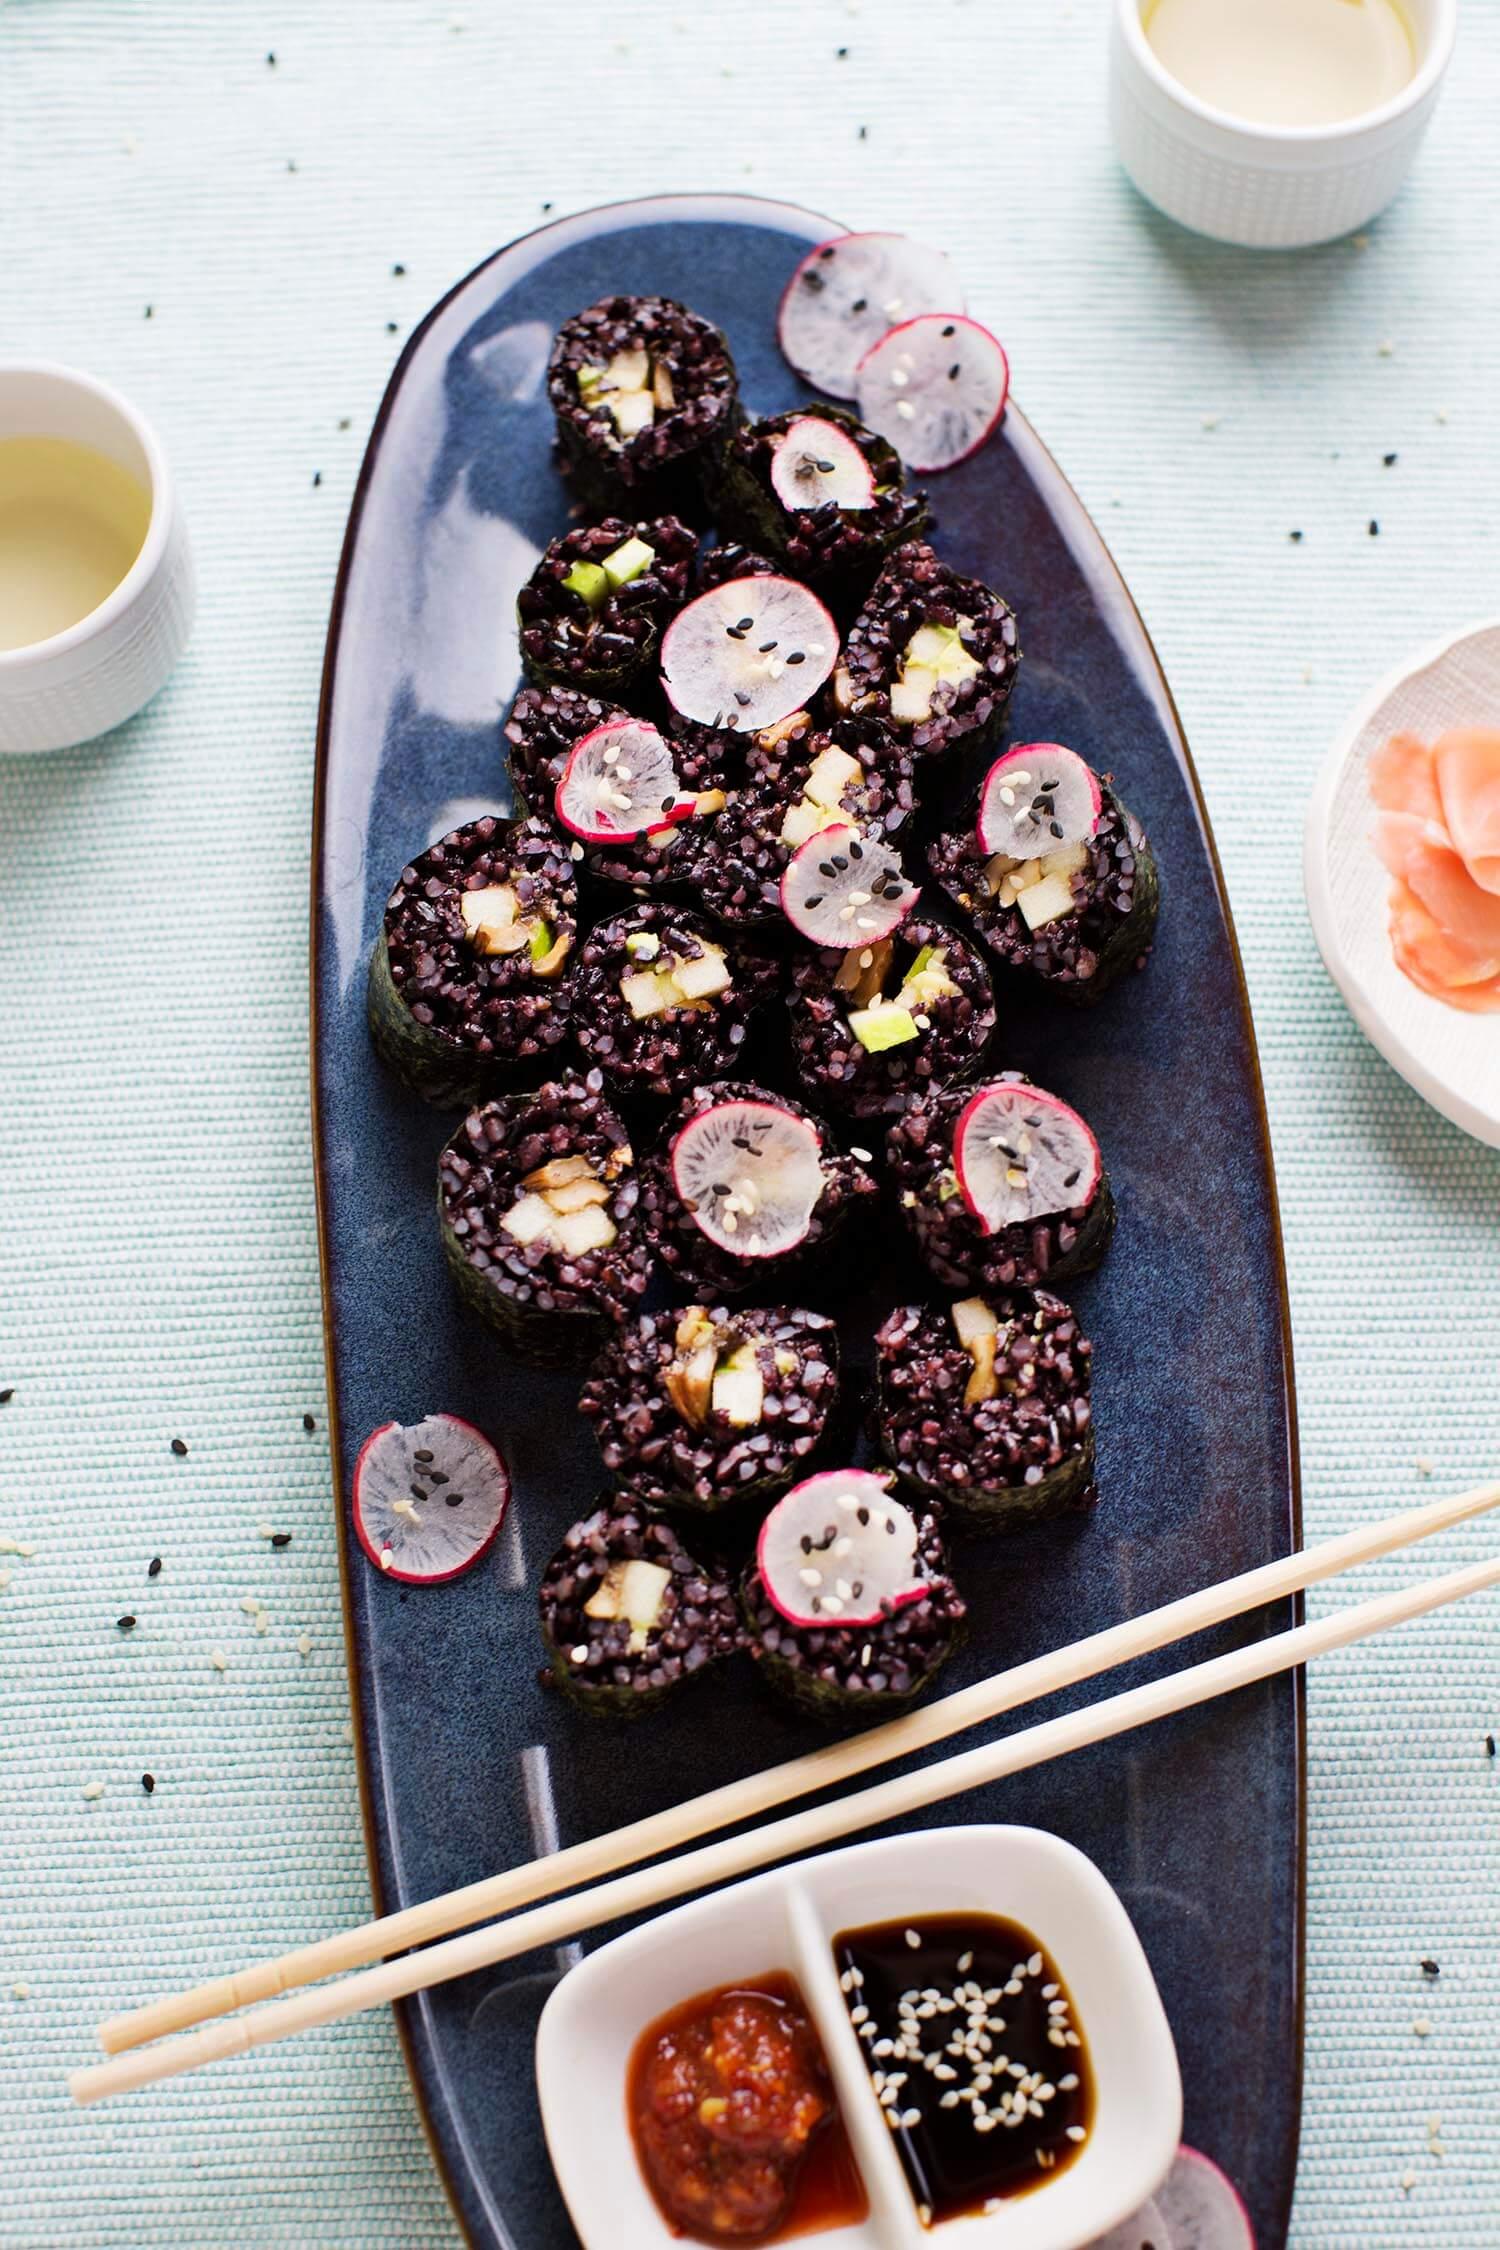 Smoky Mushroom and Black Rice Sushi (via abeautifulmess.com)